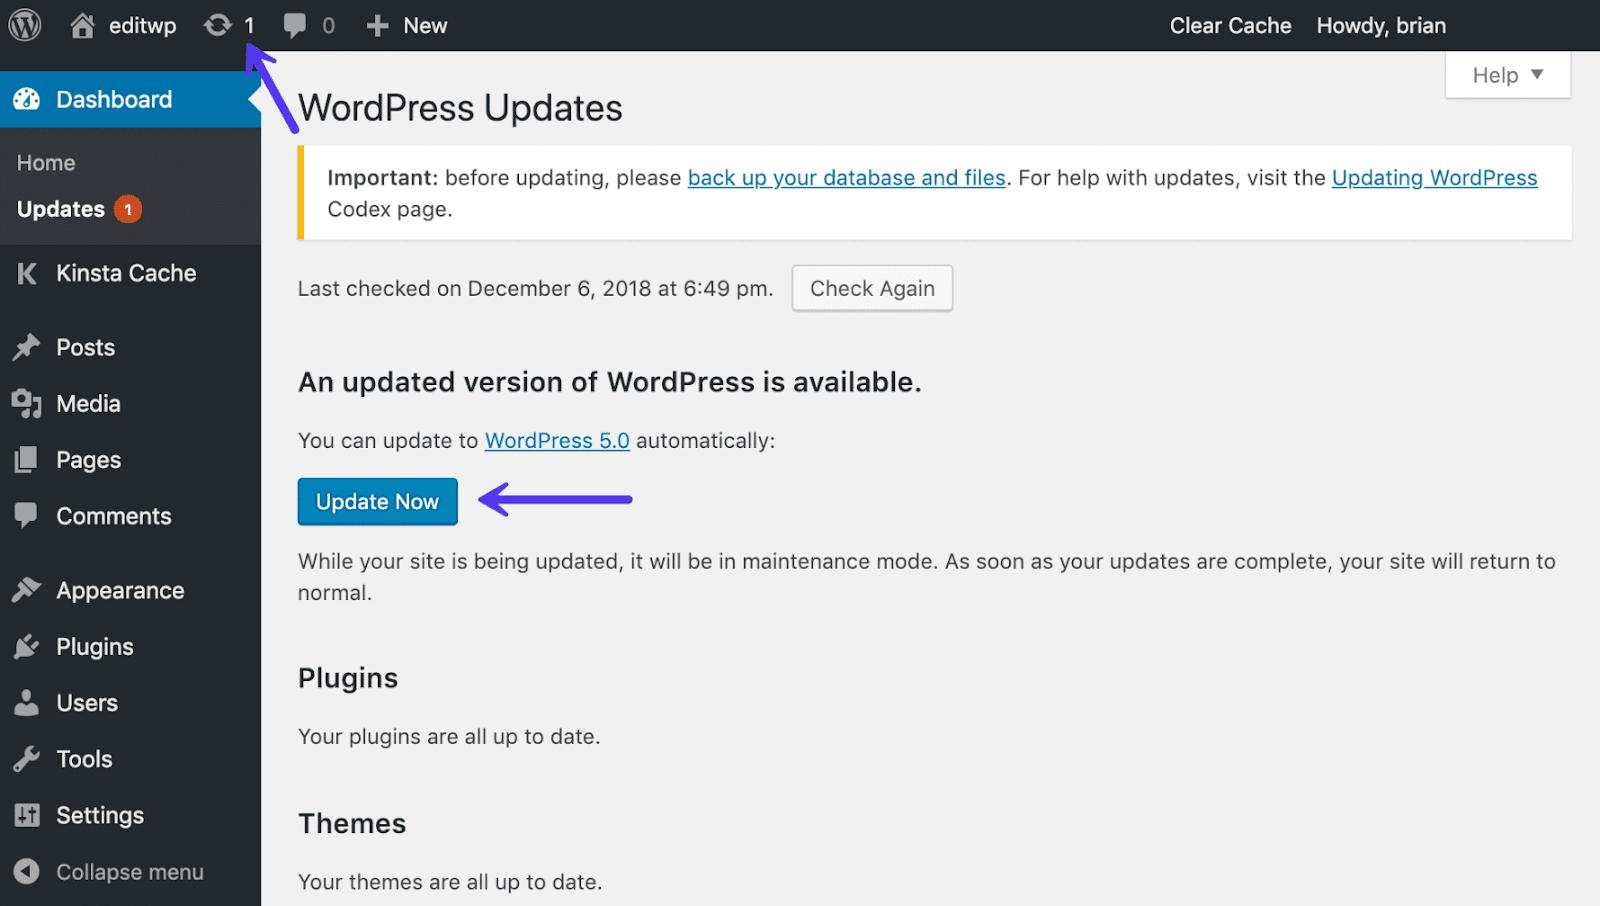 update-to-wordpress-5.0-1.png